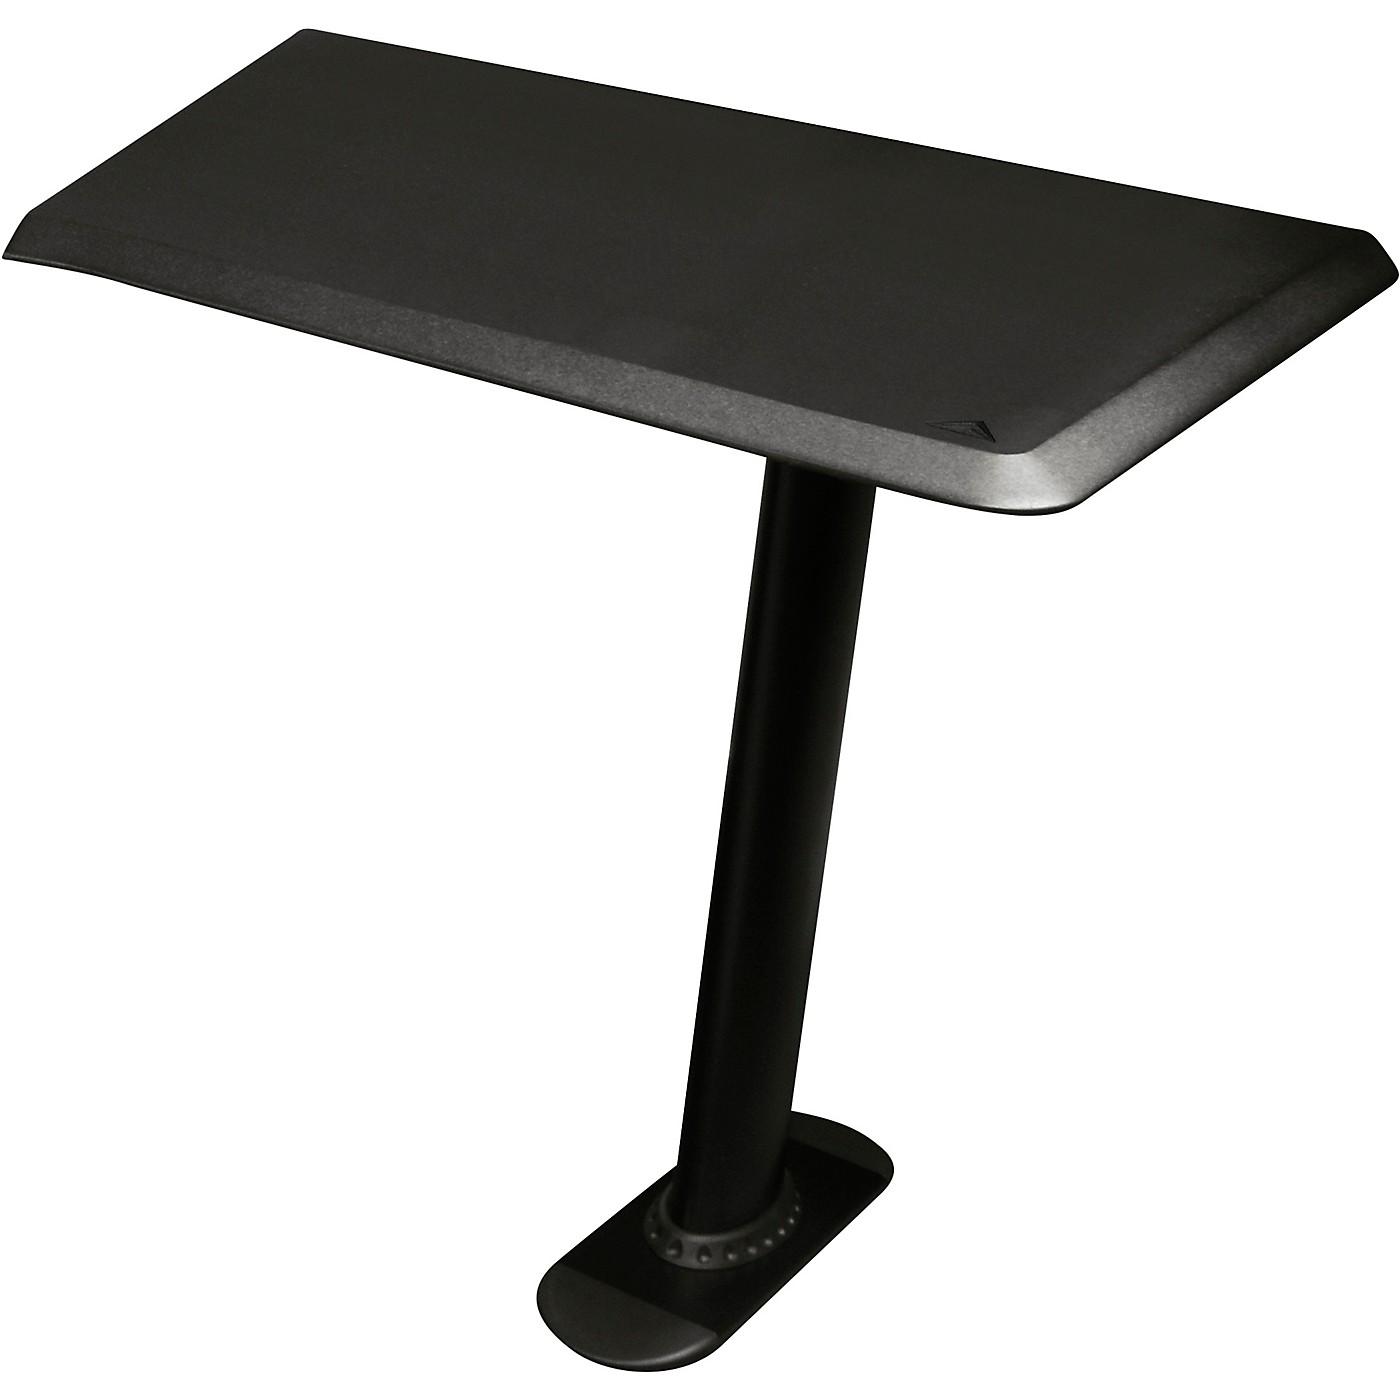 Ultimate Support NUC-EX24R Nucleus Series - Studio Desk Table Top - Single 24